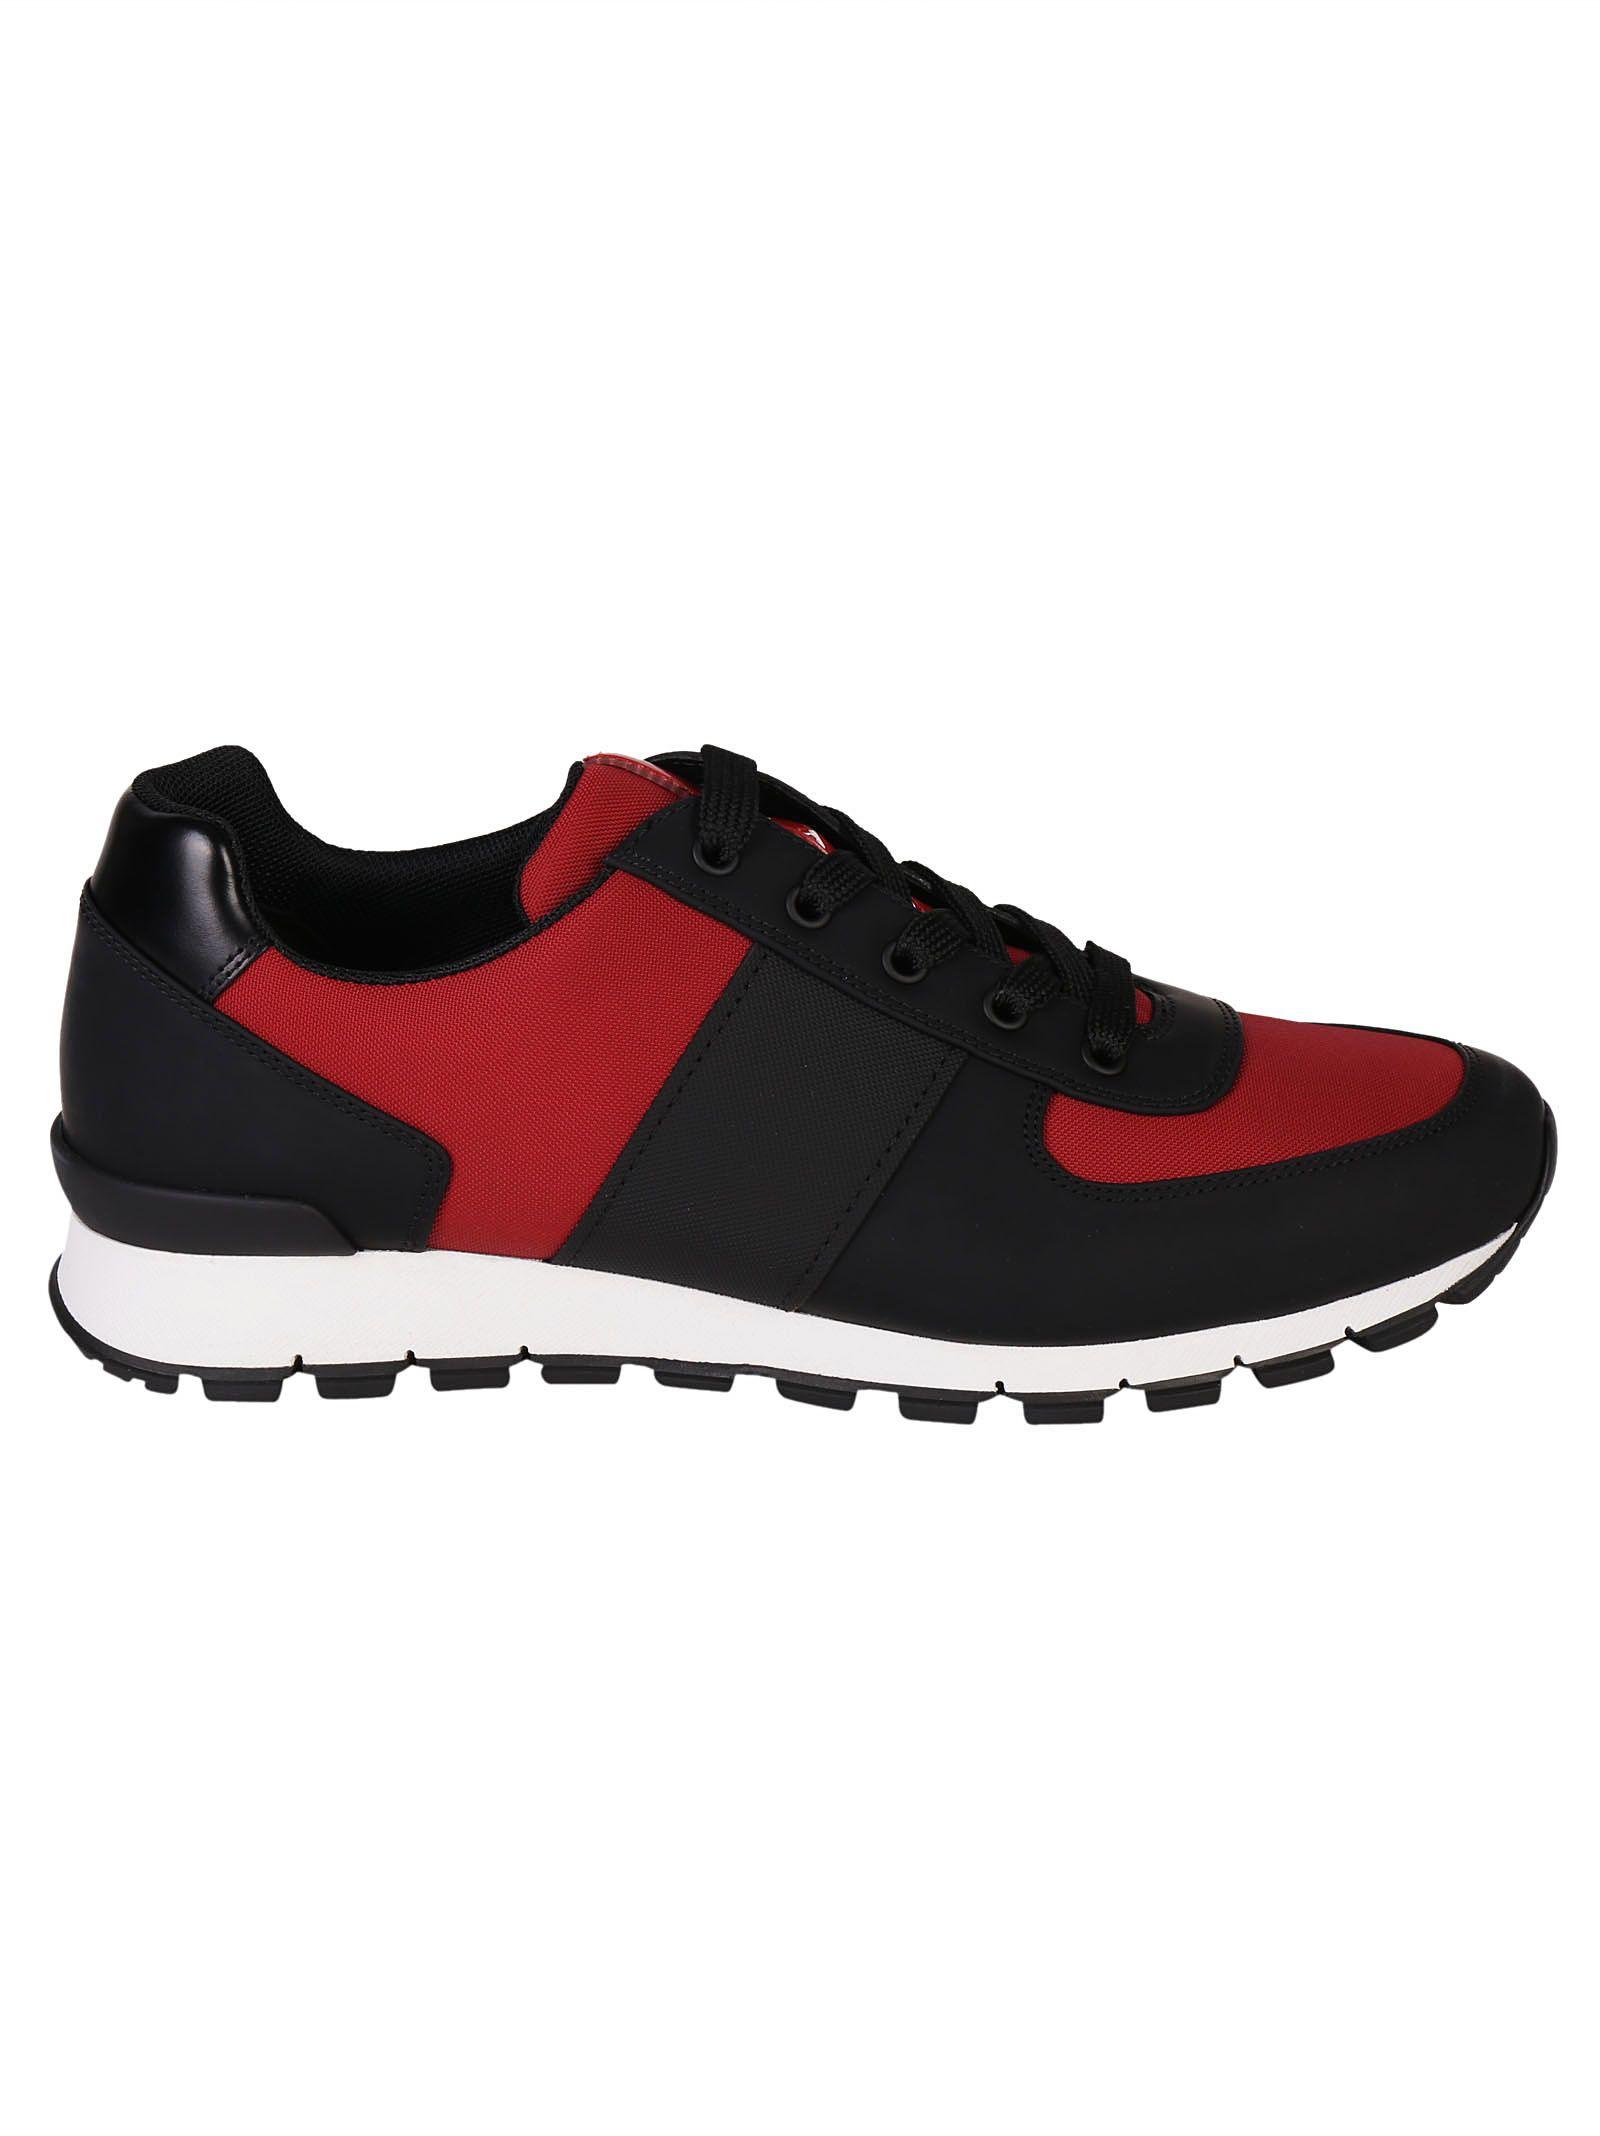 The Most Popular Prada Linea Rossa Sneakers Black+Scarlatto For Men On Sale